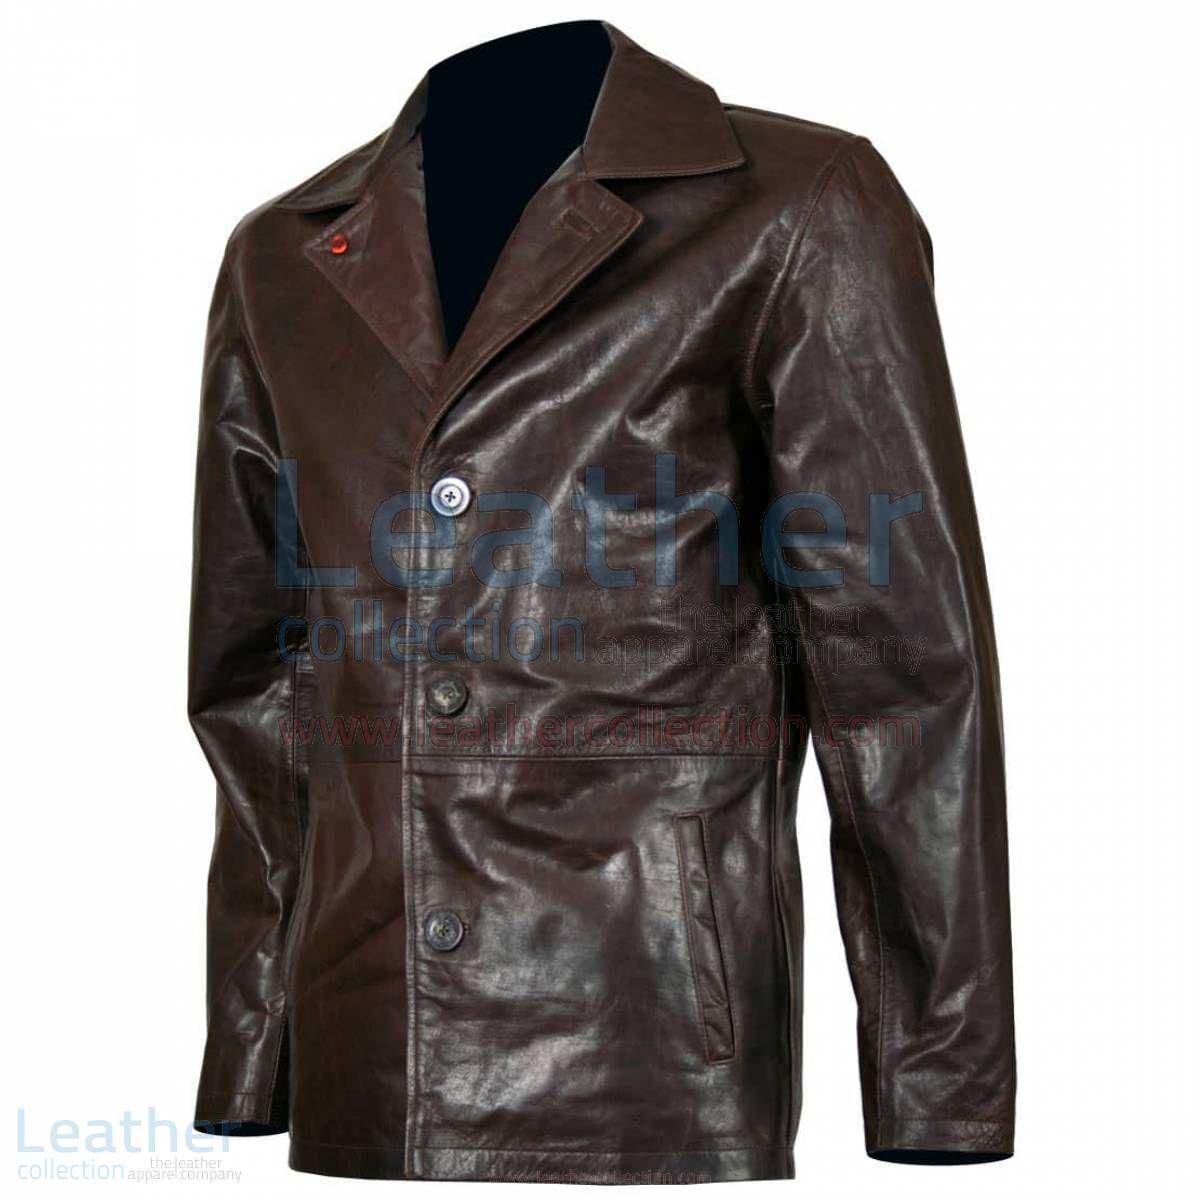 Dean Winchester Supernatural Leather Jacket Leather Jacket Leather Jacket Men Leather Jacket Shopping [ 1200 x 1200 Pixel ]